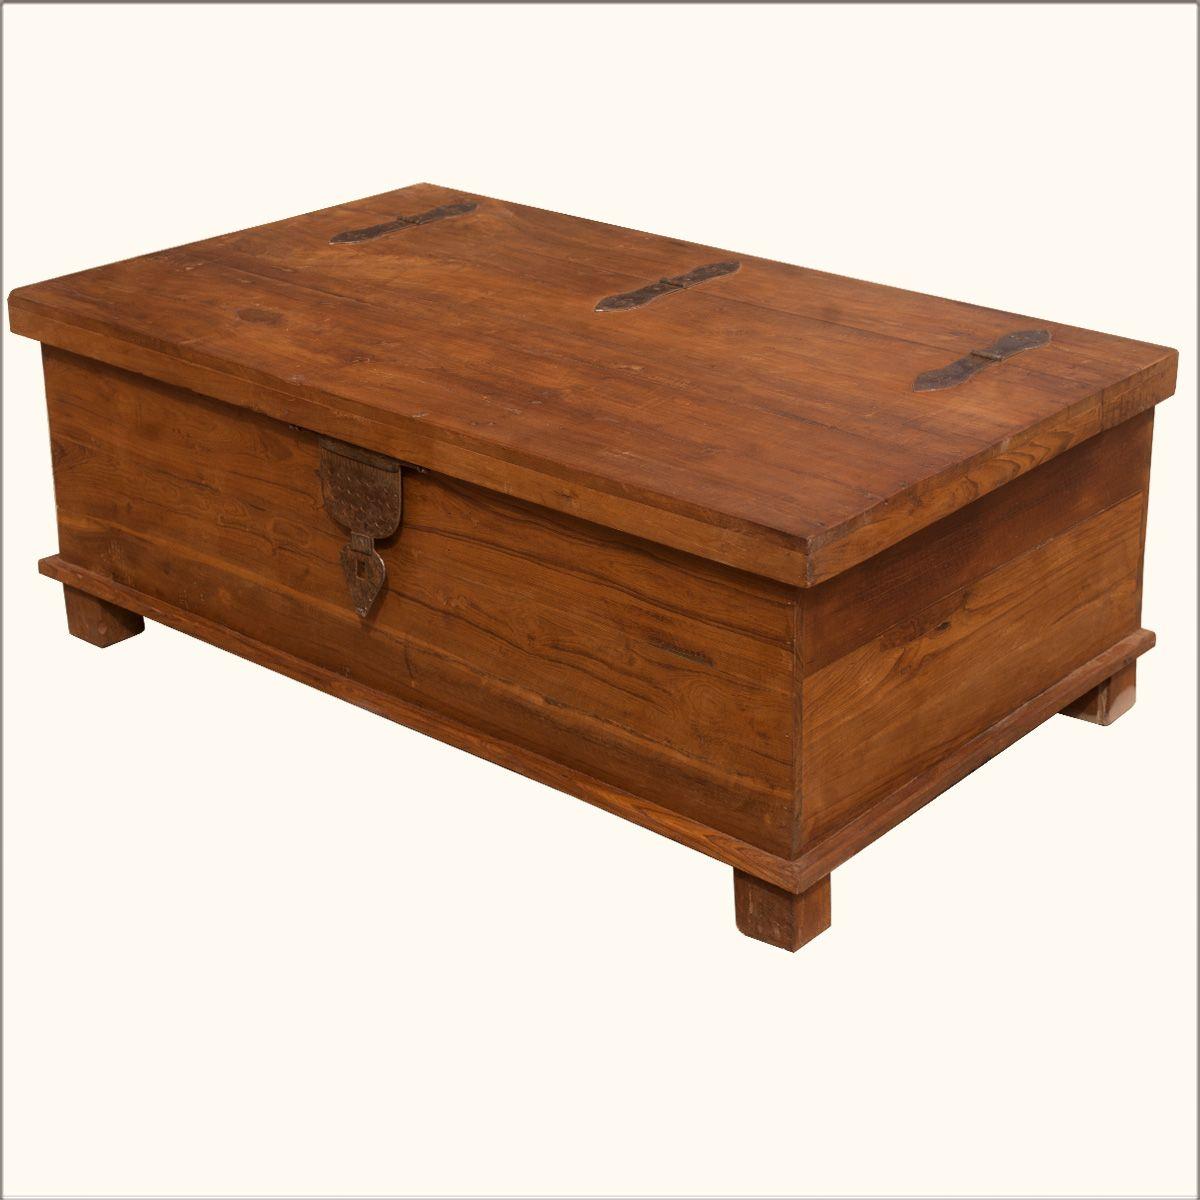 Rustic Teak Wood Wrought Iron Distressed Coffee Table Storage Box Coffee Table Wood Wood Coffee Table Storage Coffee Table Storage Box [ 1200 x 1200 Pixel ]